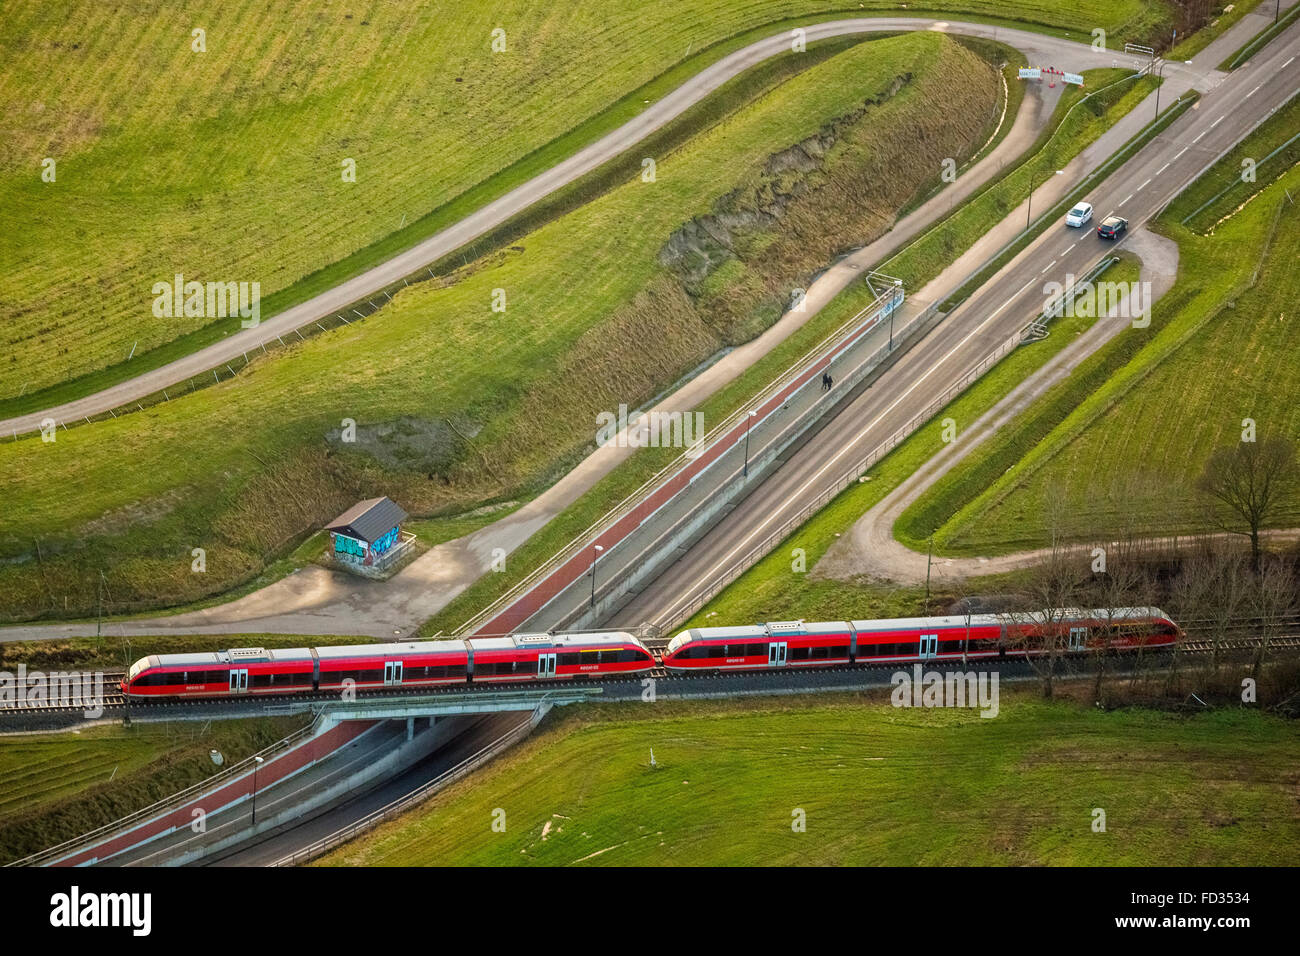 Luftbild, s-Bahn, Bahn, s-Bahn kreuzt eine Auto Unterführung Eisenbahnbrücke, nahe dem Bahnhof Bockum Stockbild